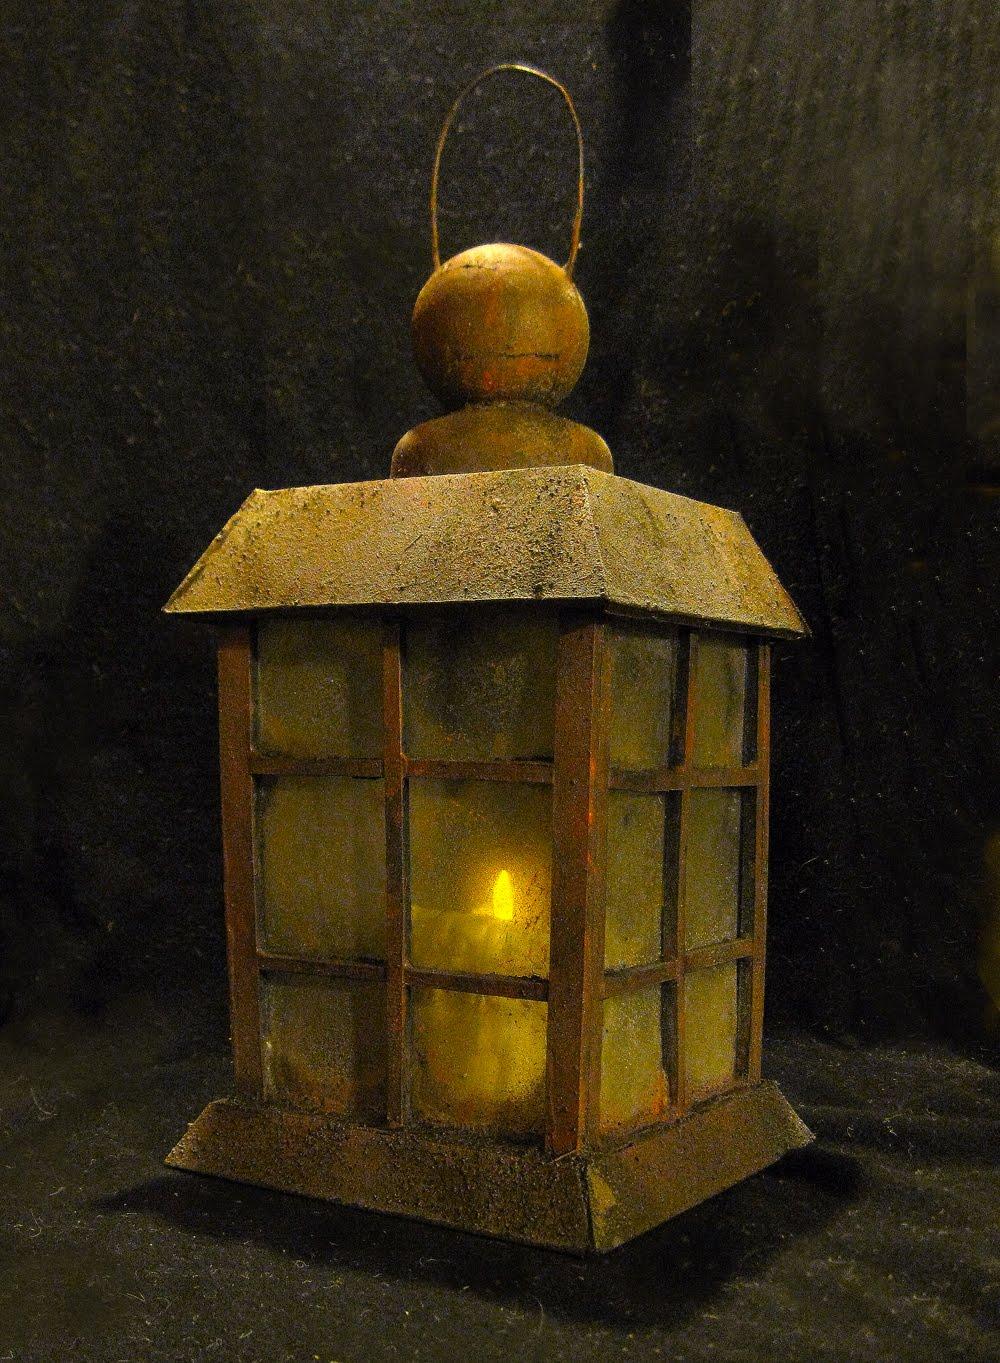 DAVE LOWE DESIGN the Blog: O'Treaty's Foamcore Lantern ...